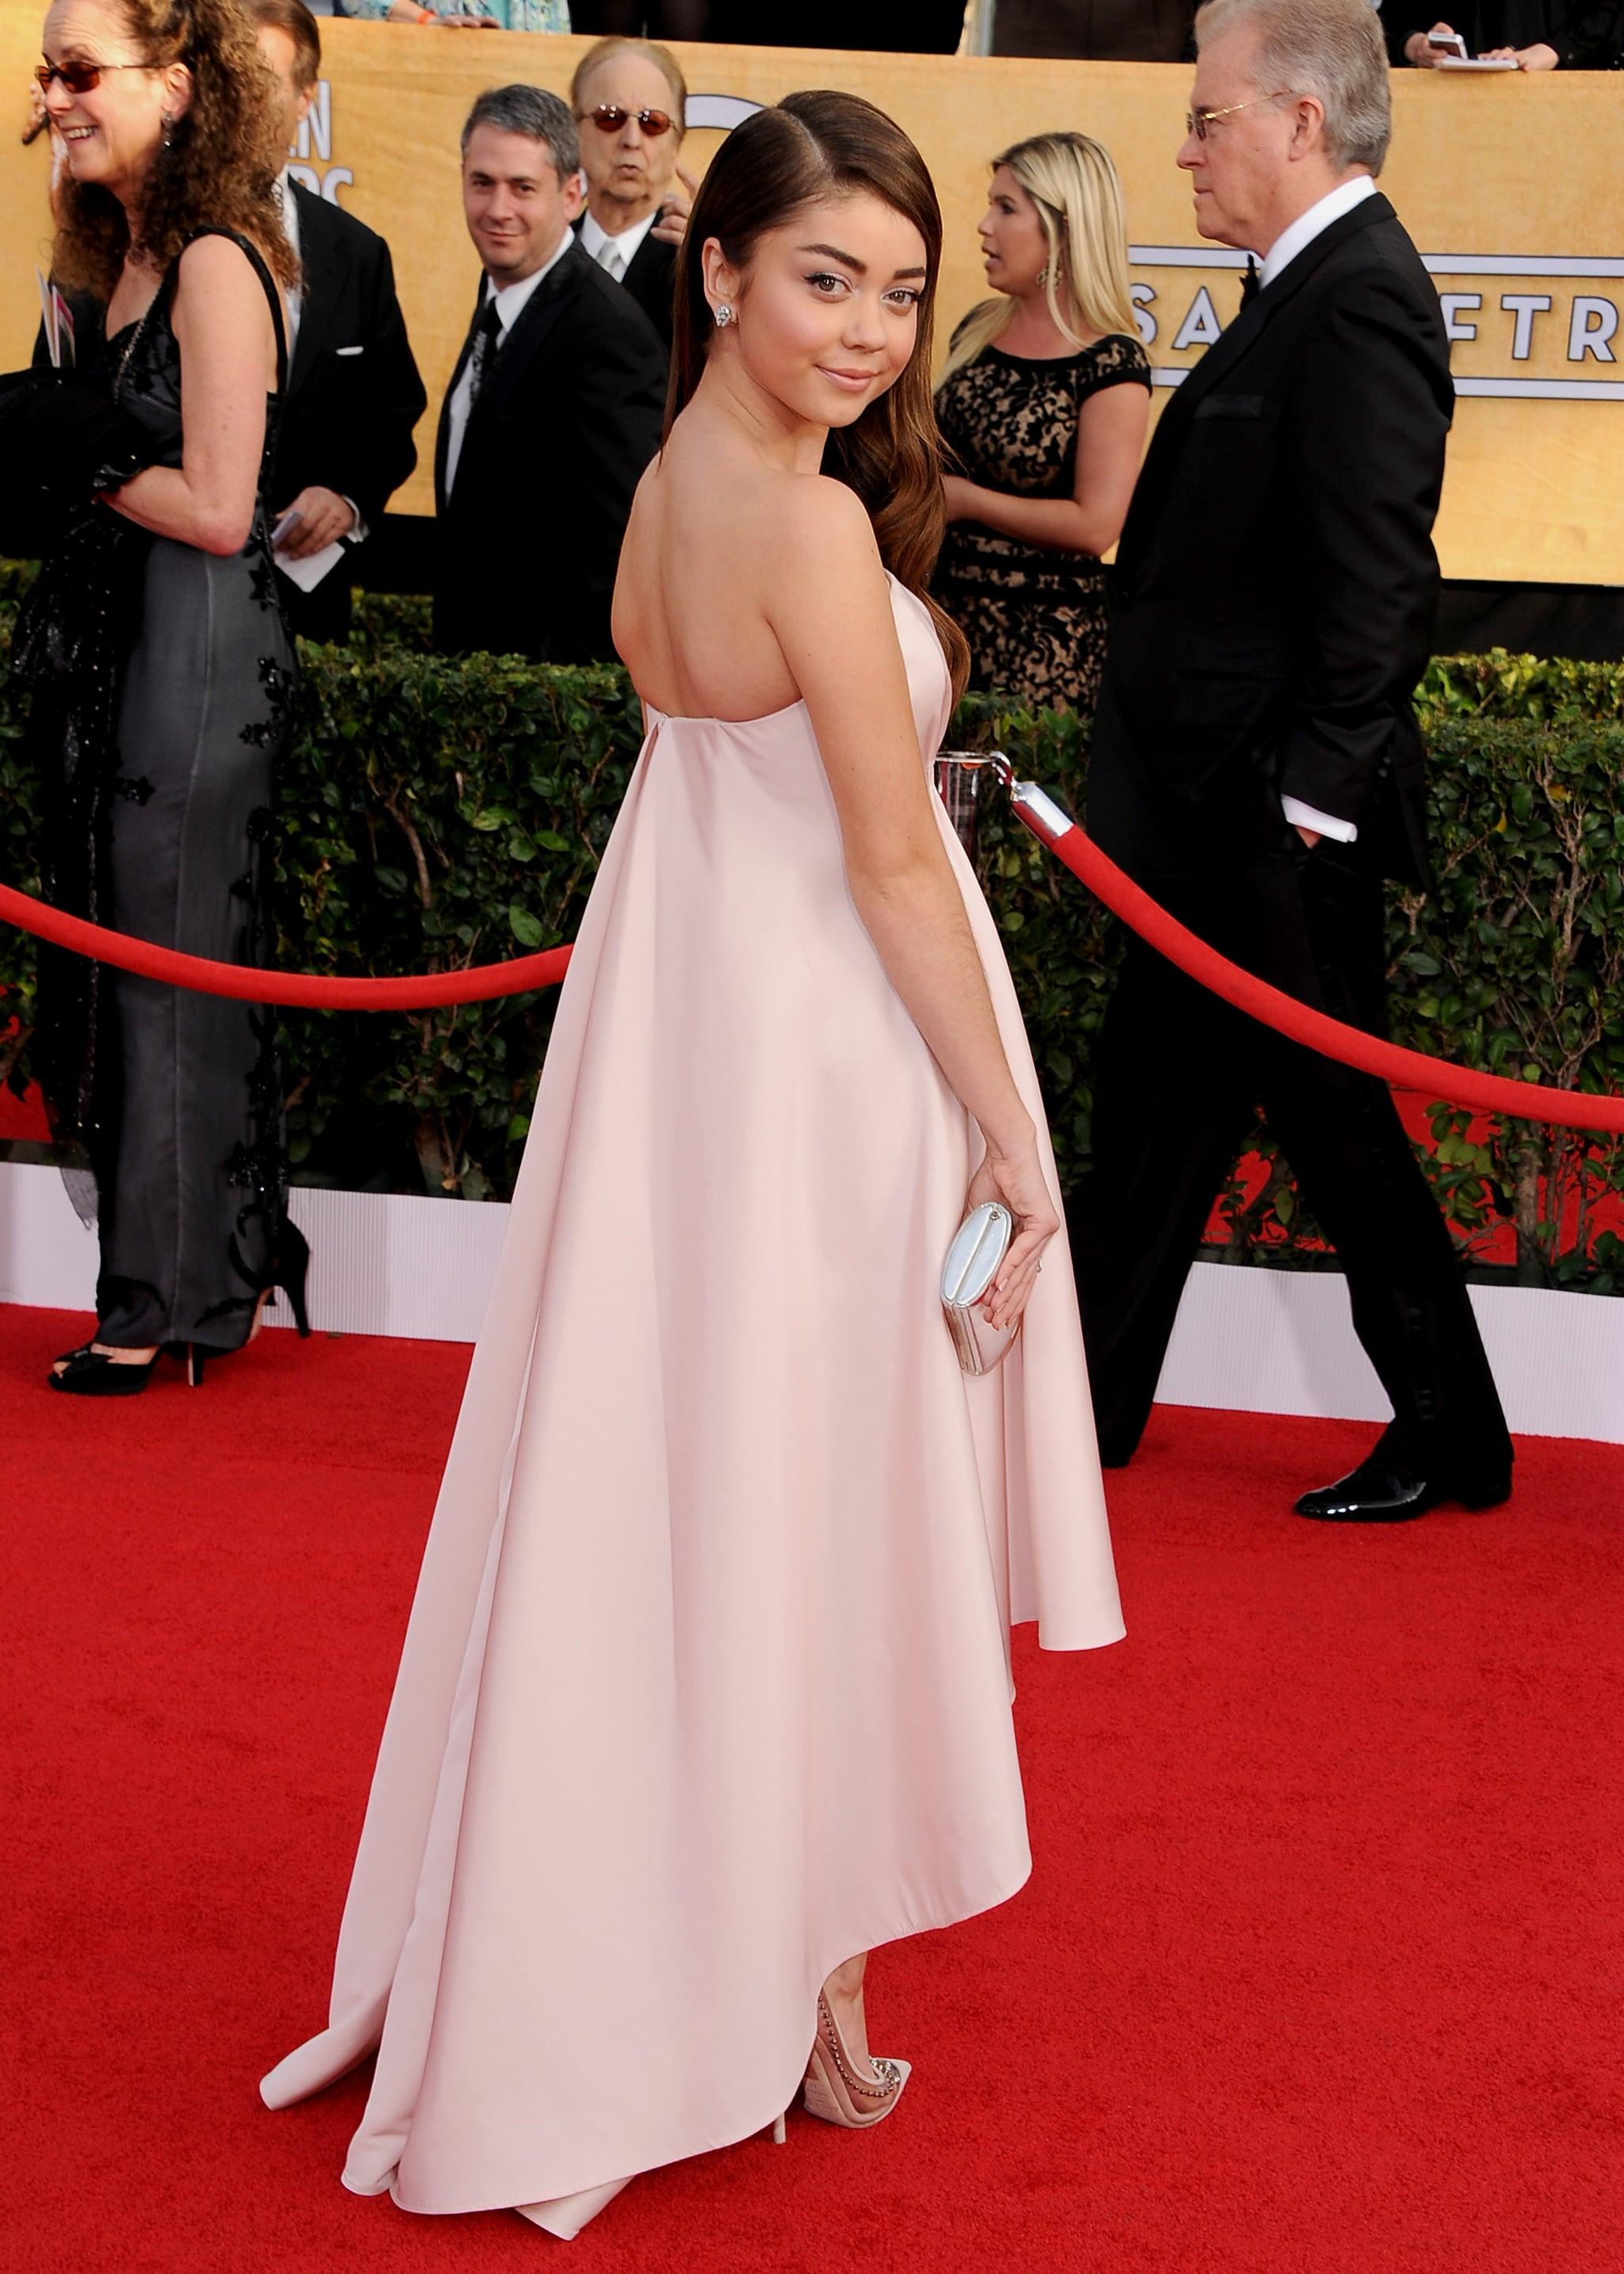 Sarah Hyland showed off her strapless dress.